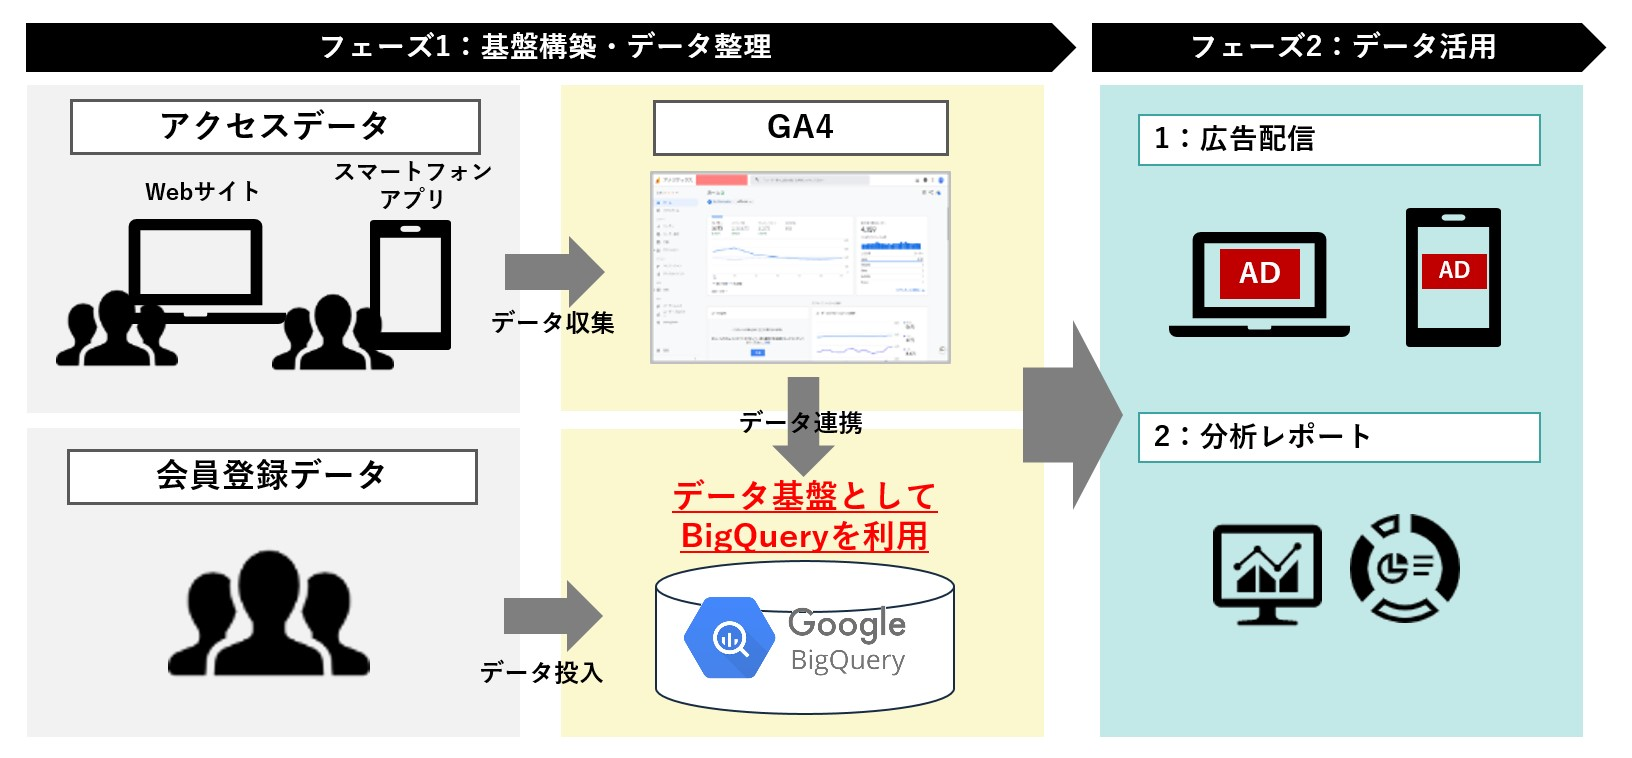 CCI、『Google アナリティクス 4 プロパティ』を活用した データ基盤構築サービスの提供を開始